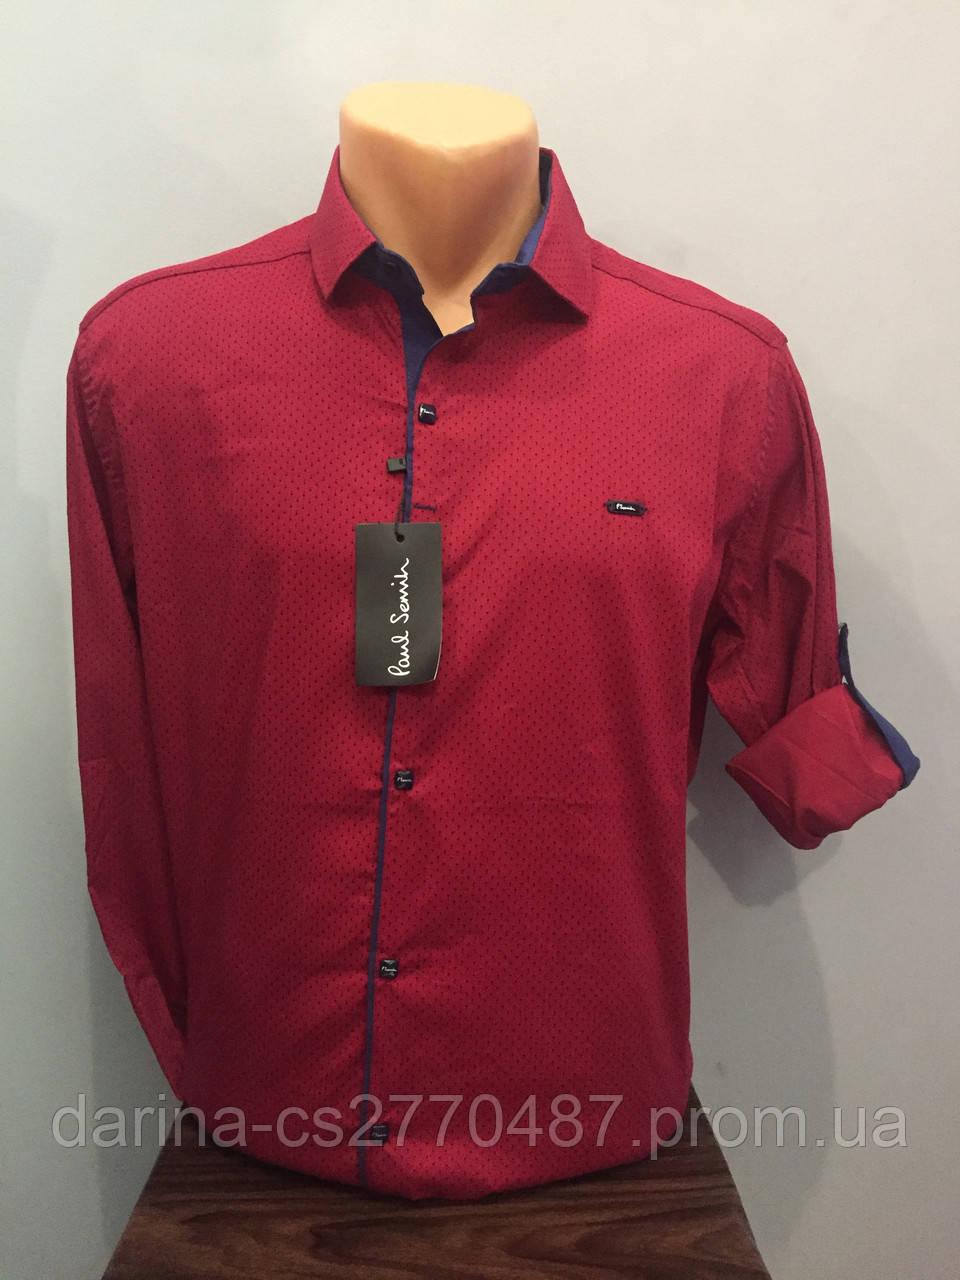 Мужская рубашка турецкая модная М